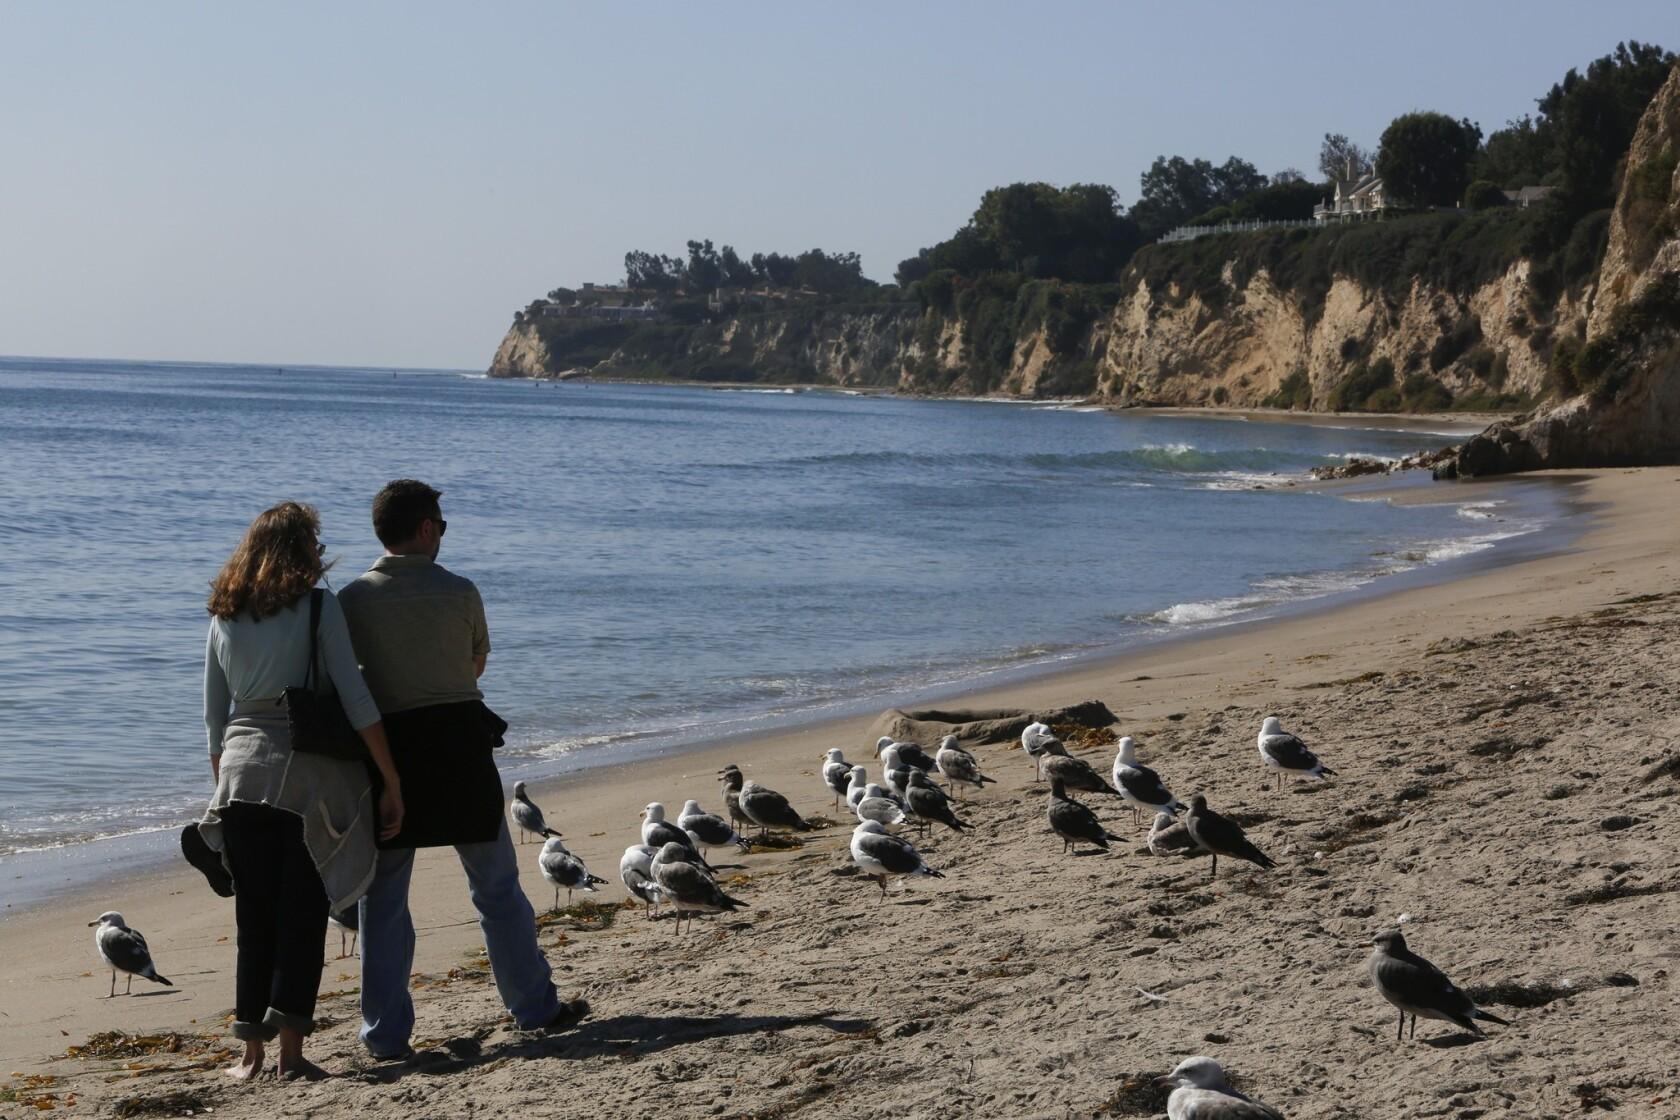 Surfers regain access to Malibu's Paradise Cove; pier to be unlocked